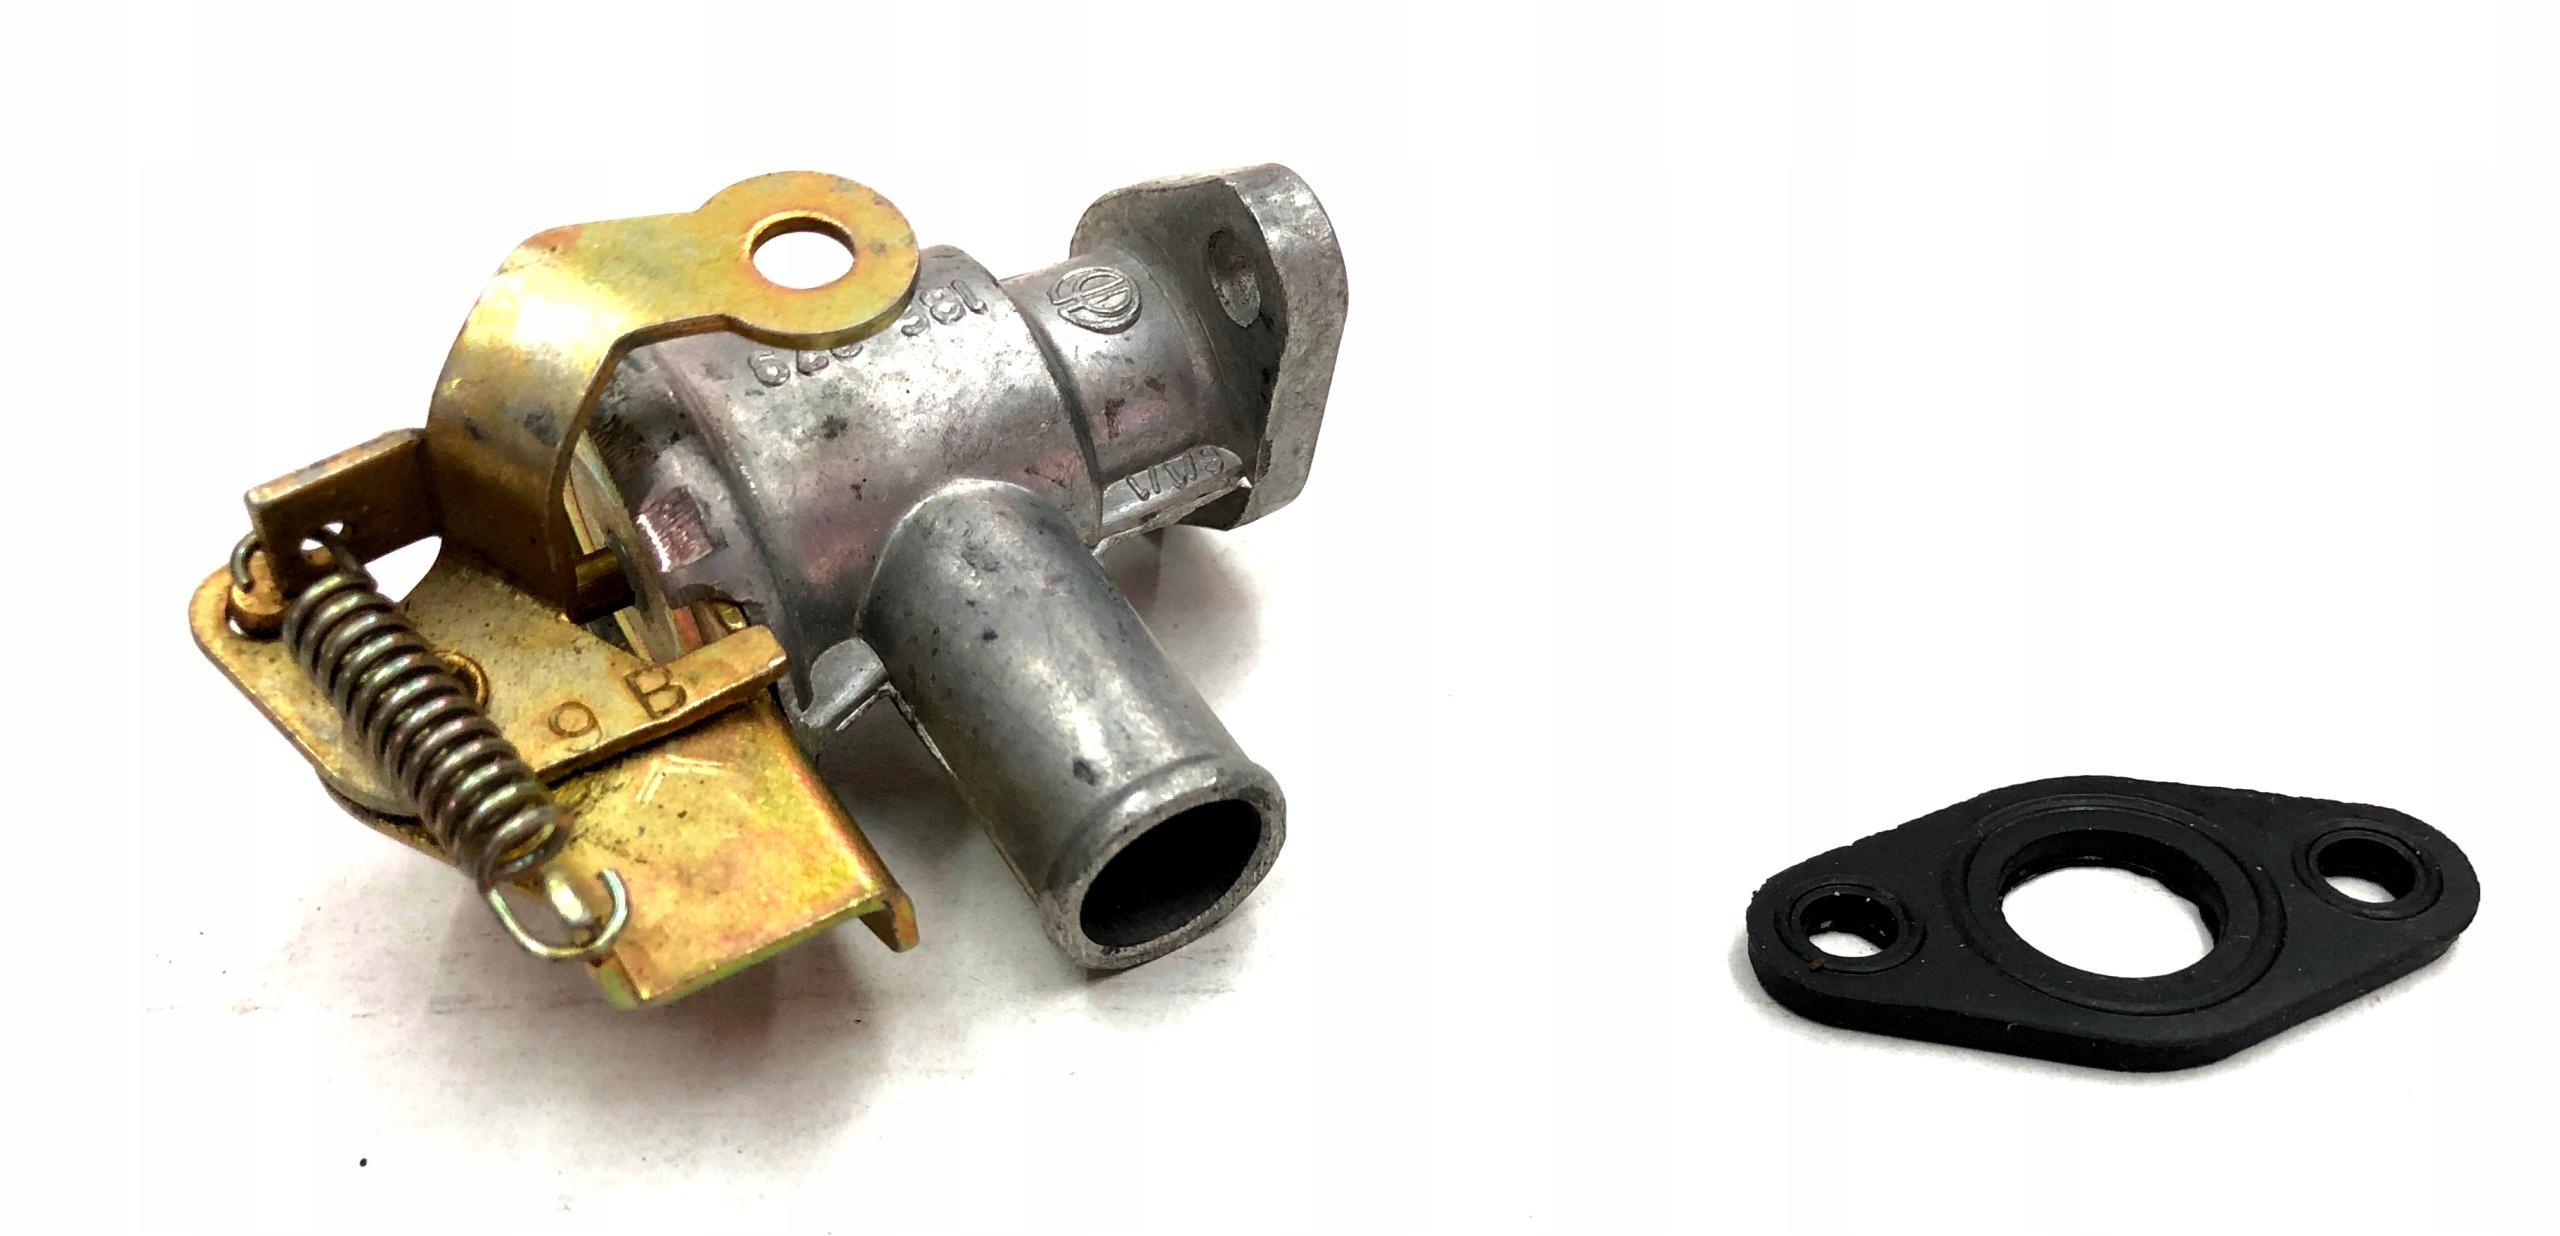 клапан нагревателя fso fiat 125p полонез +uszczelka